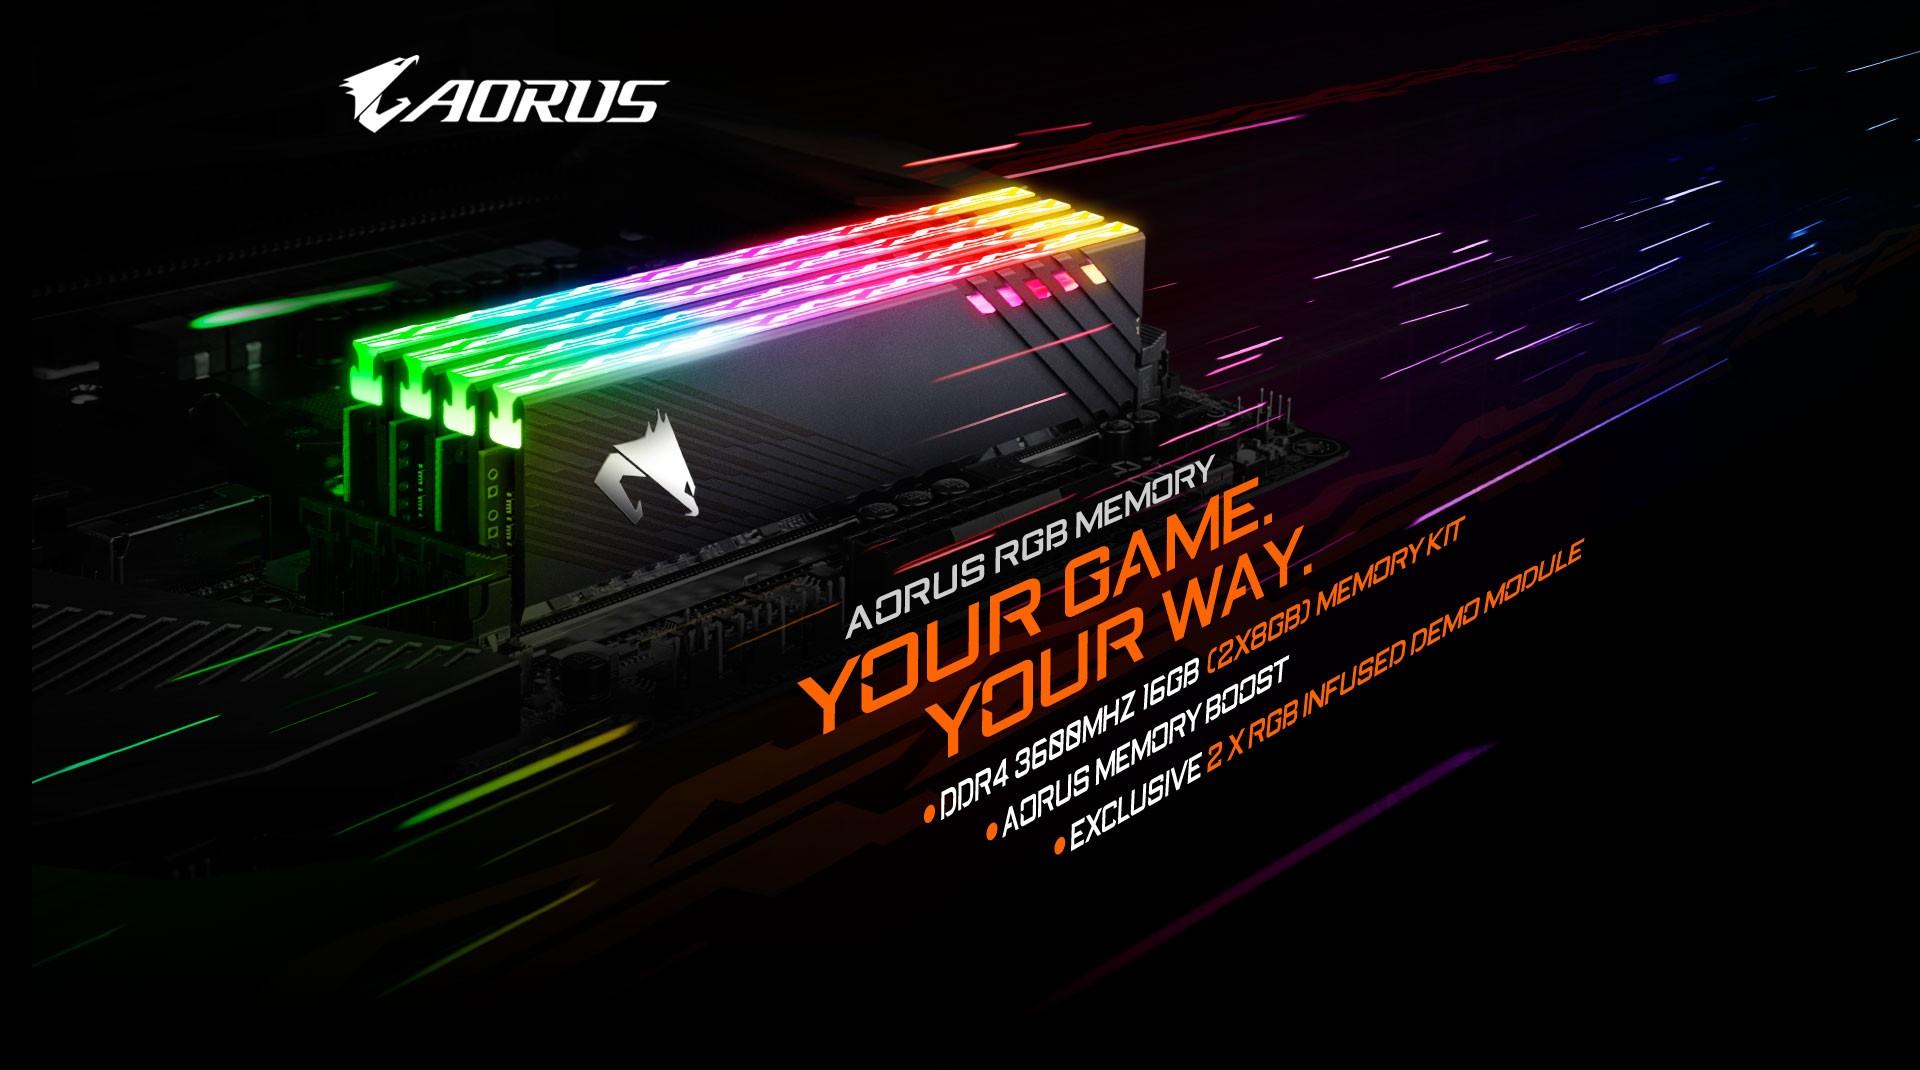 Ram Gigabyte AORUS RGB Memory 16GB 3600MHz demo kit